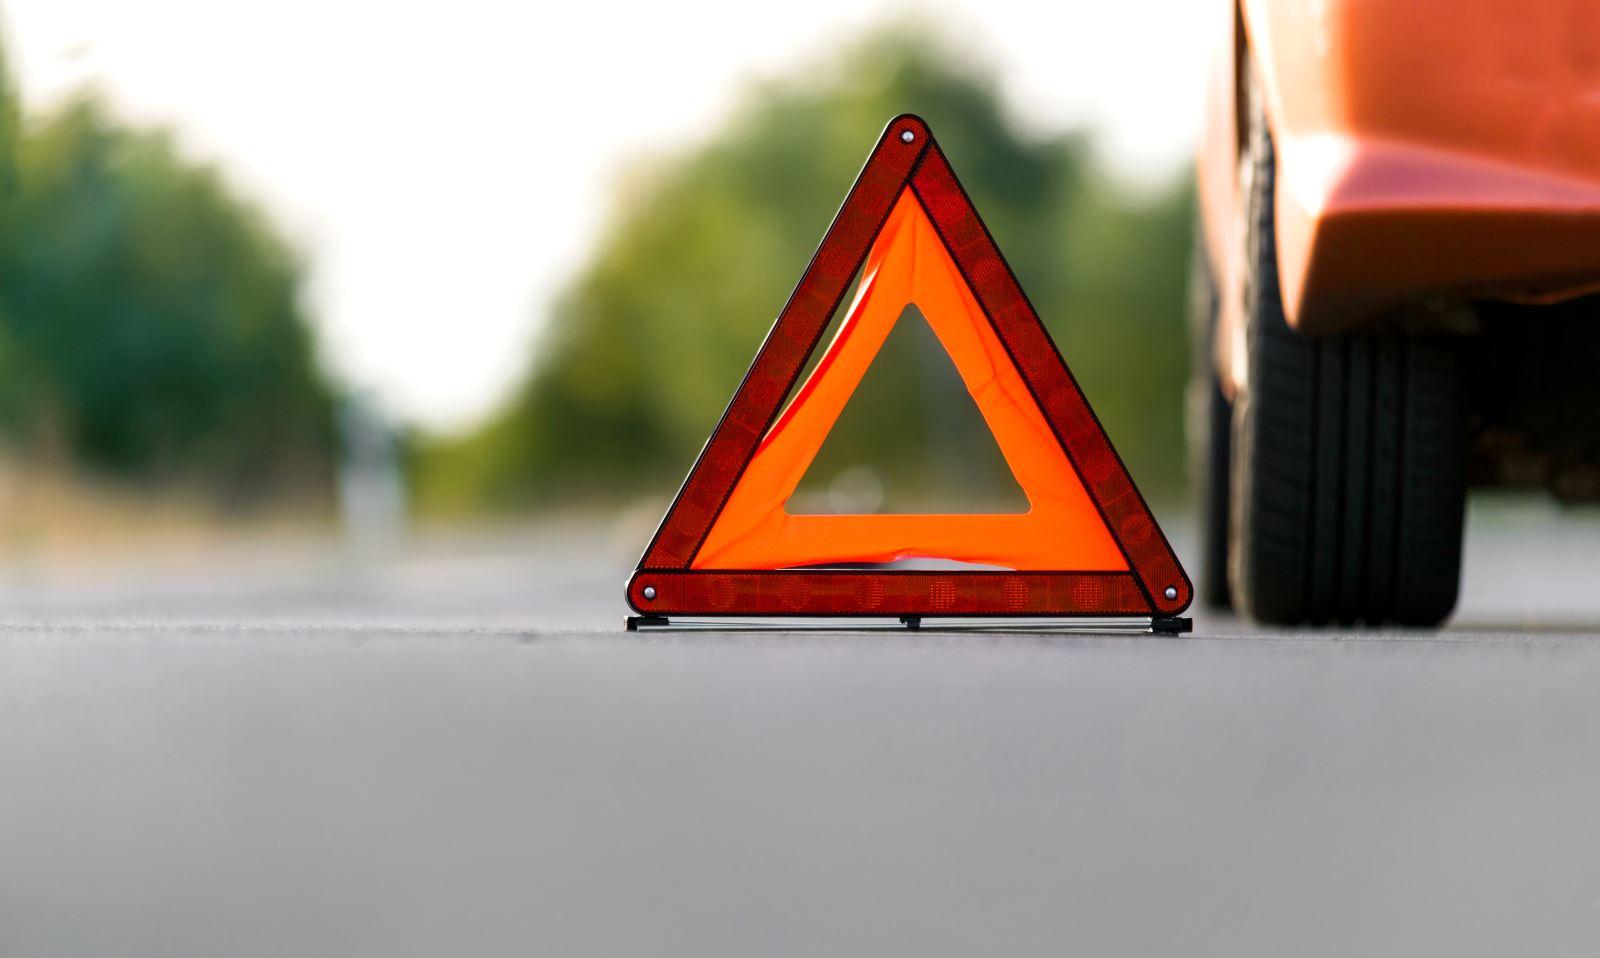 triangolo d'emergenza stradale